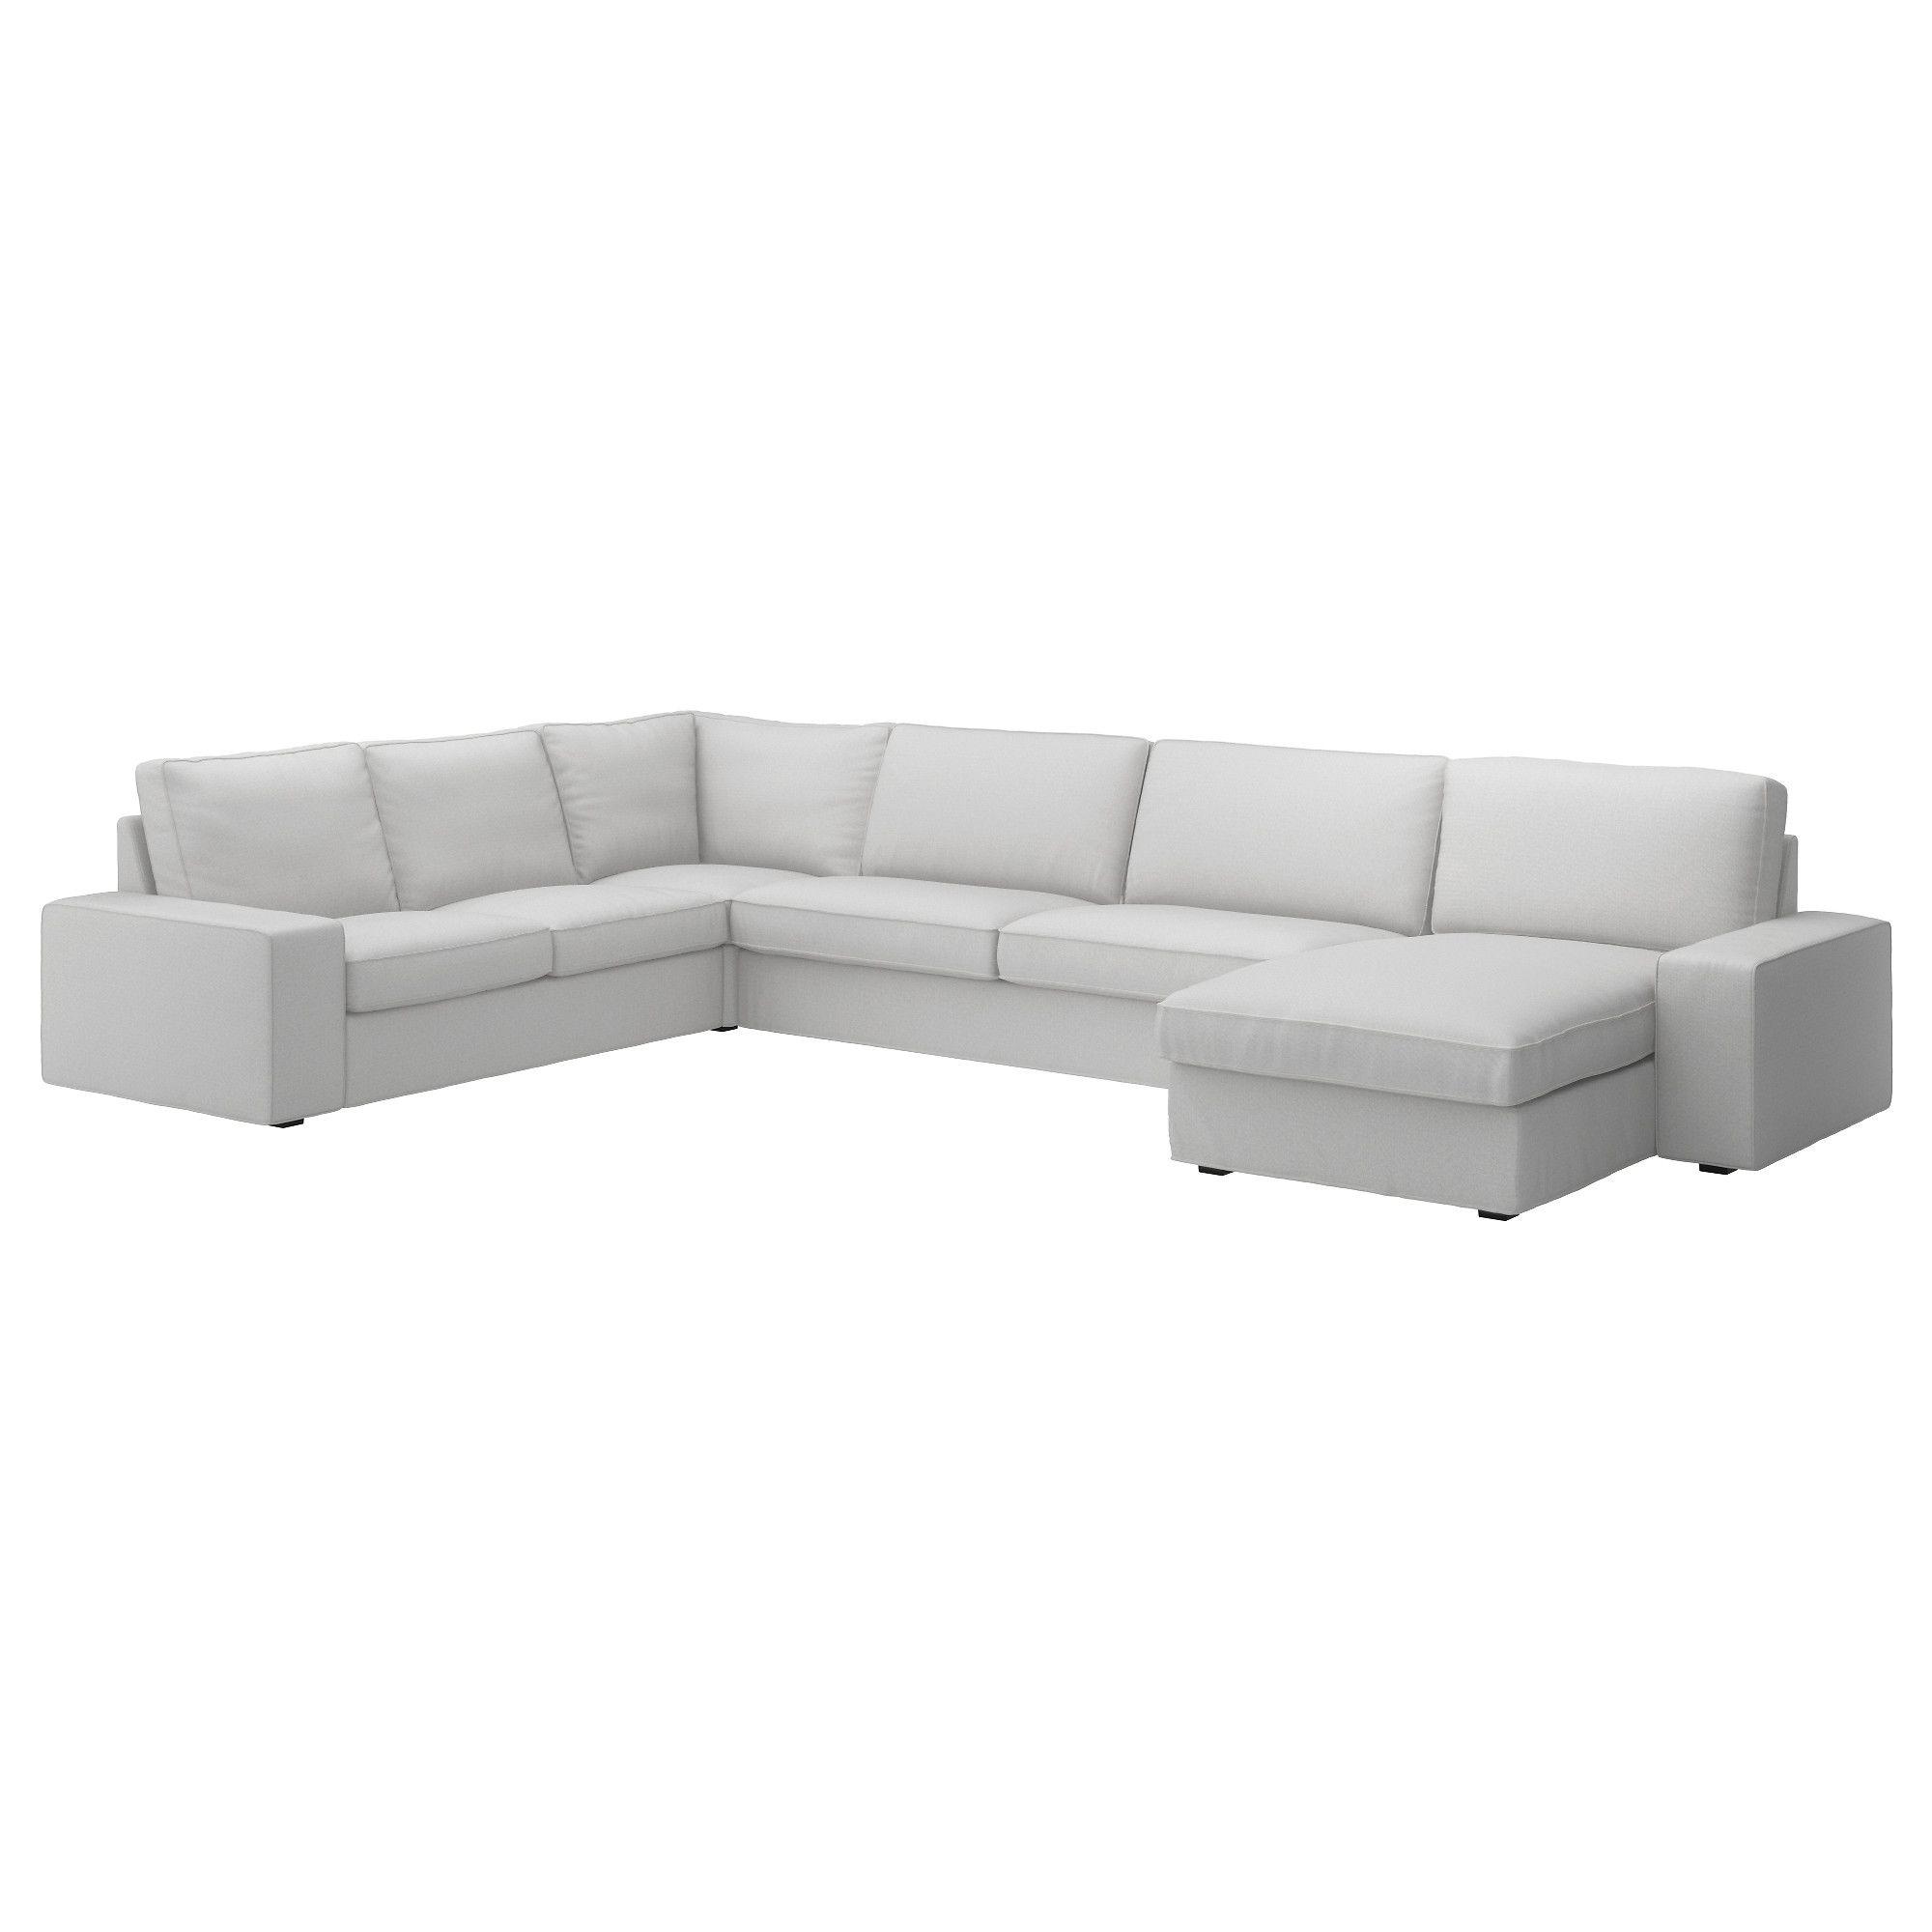 Kivik With Chaise Longue Ramna Light Grey Corner Sofa 6 Seat Ikea Ikea Sectional Grey Corner Sofa Kivik Sofa